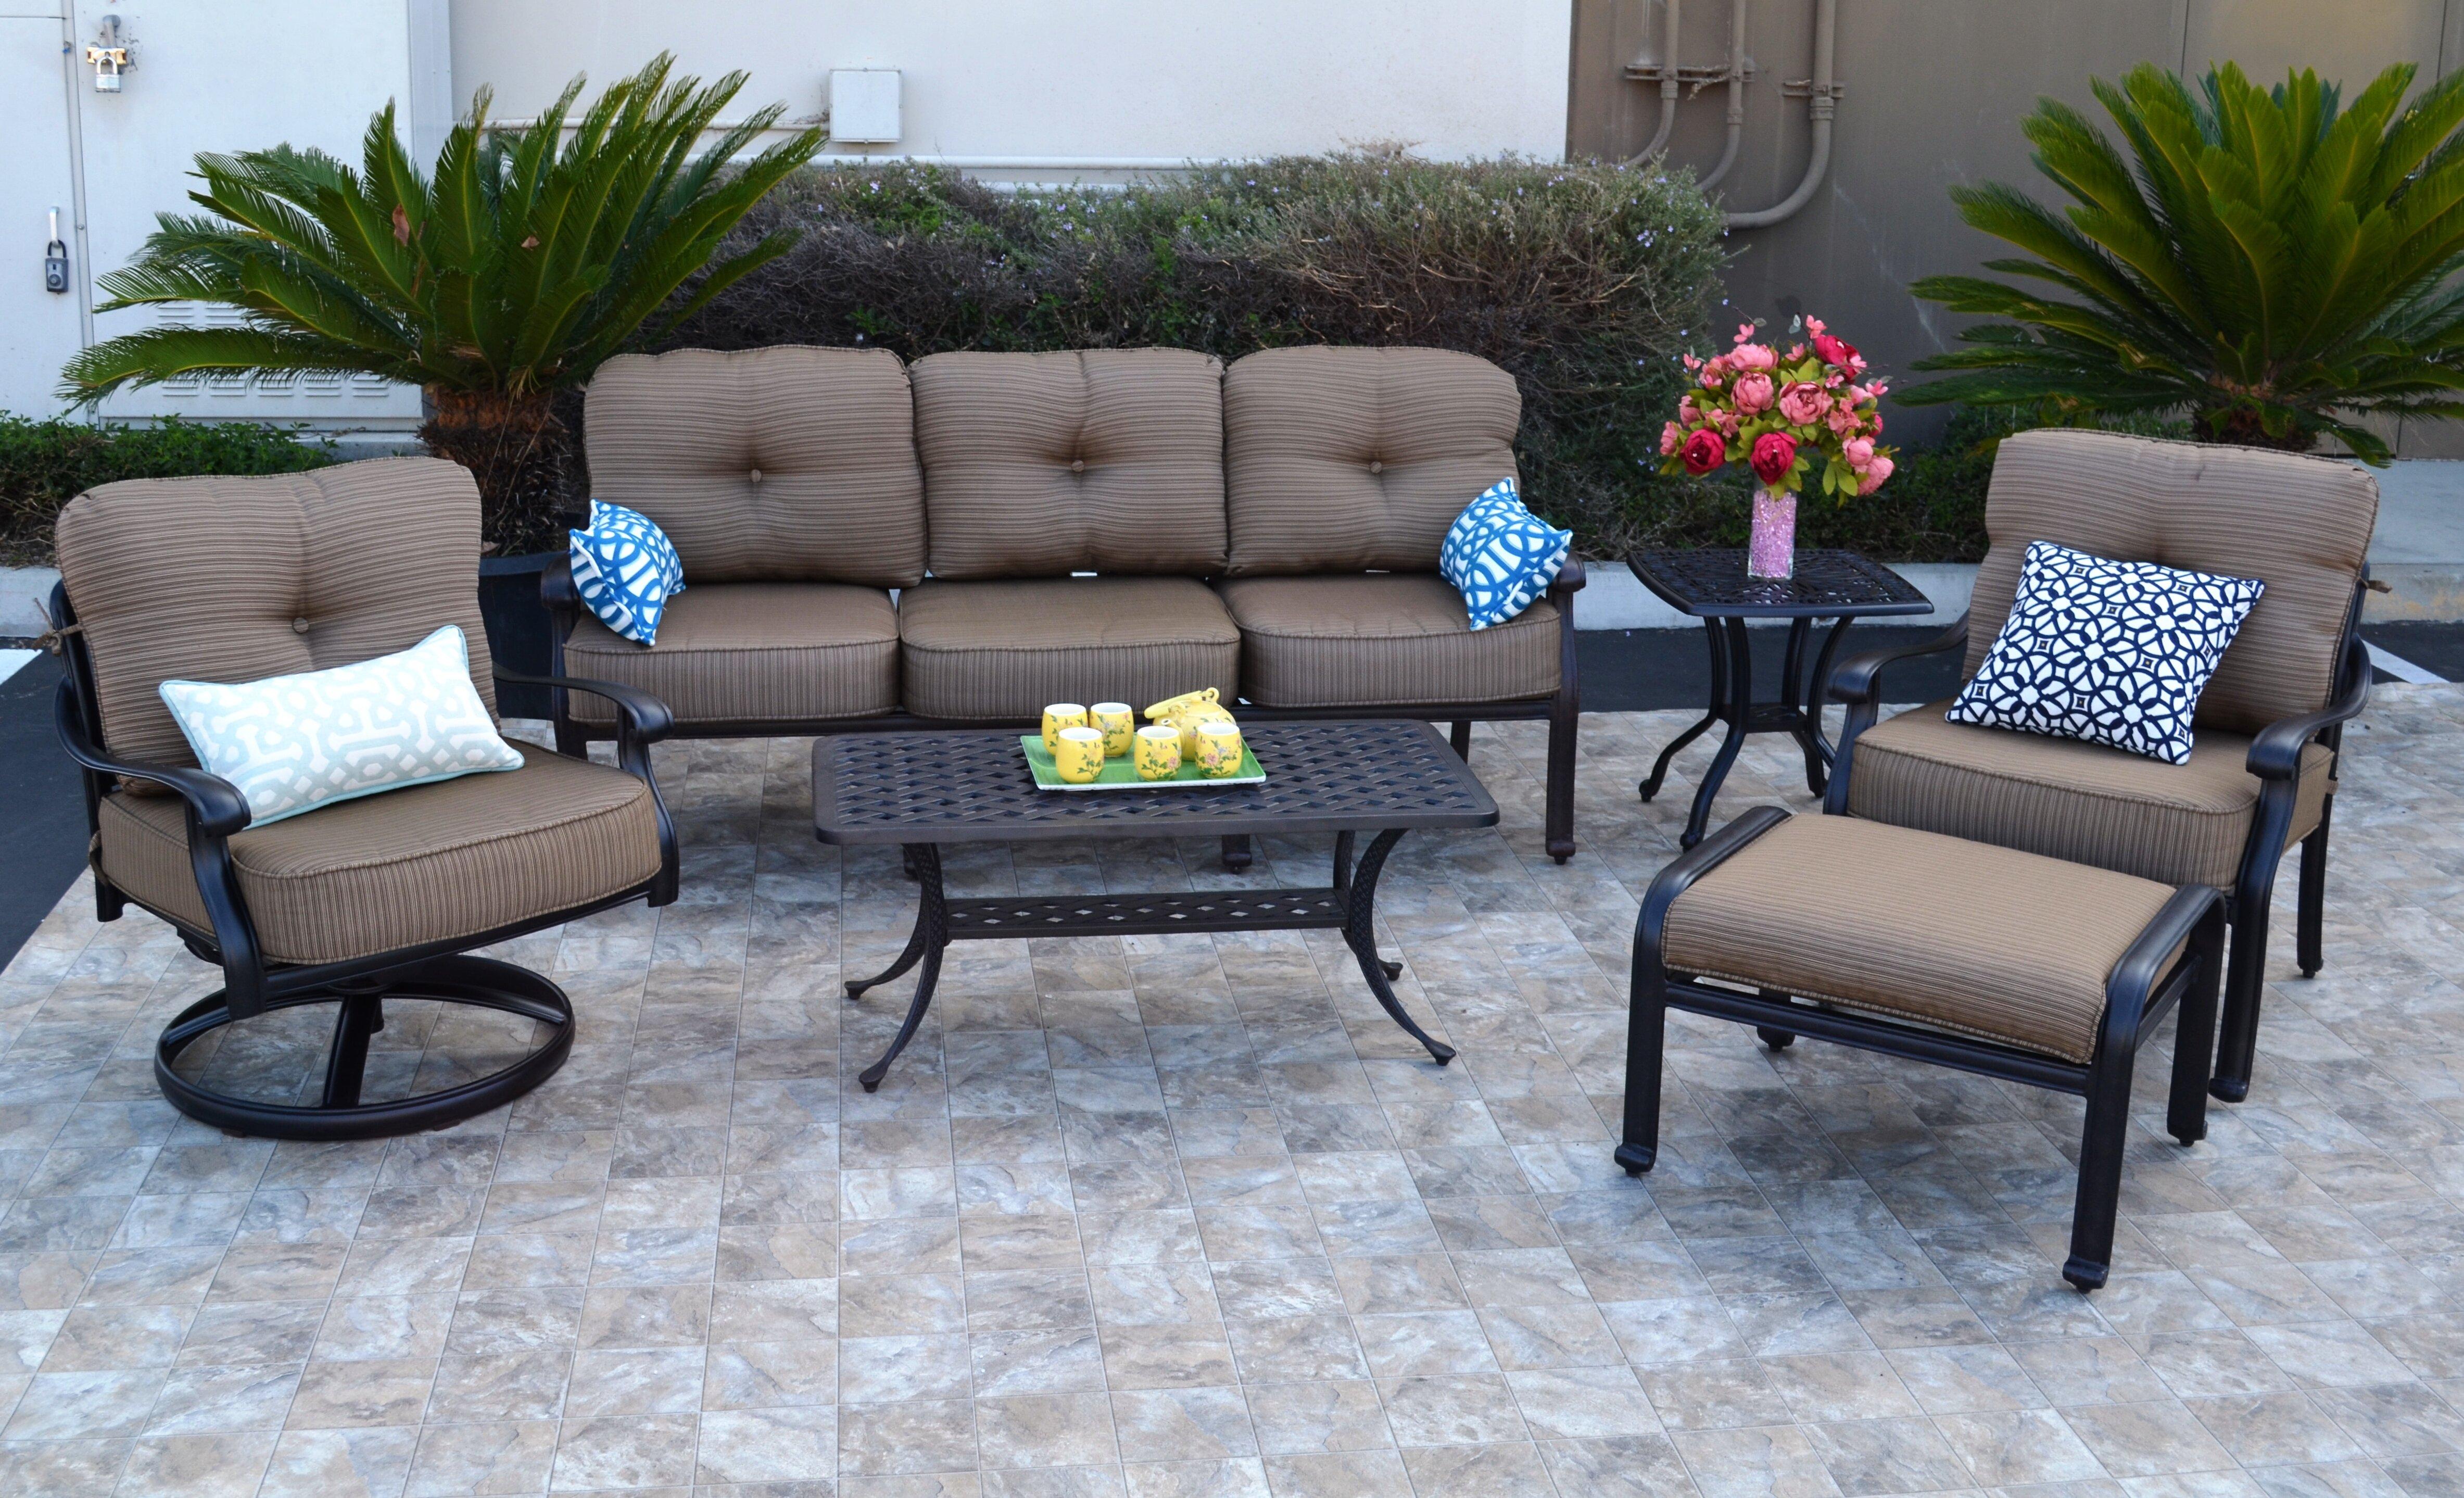 Darby Home Co Nola 6 Piece Sofa Seating Group Reviews Wayfair